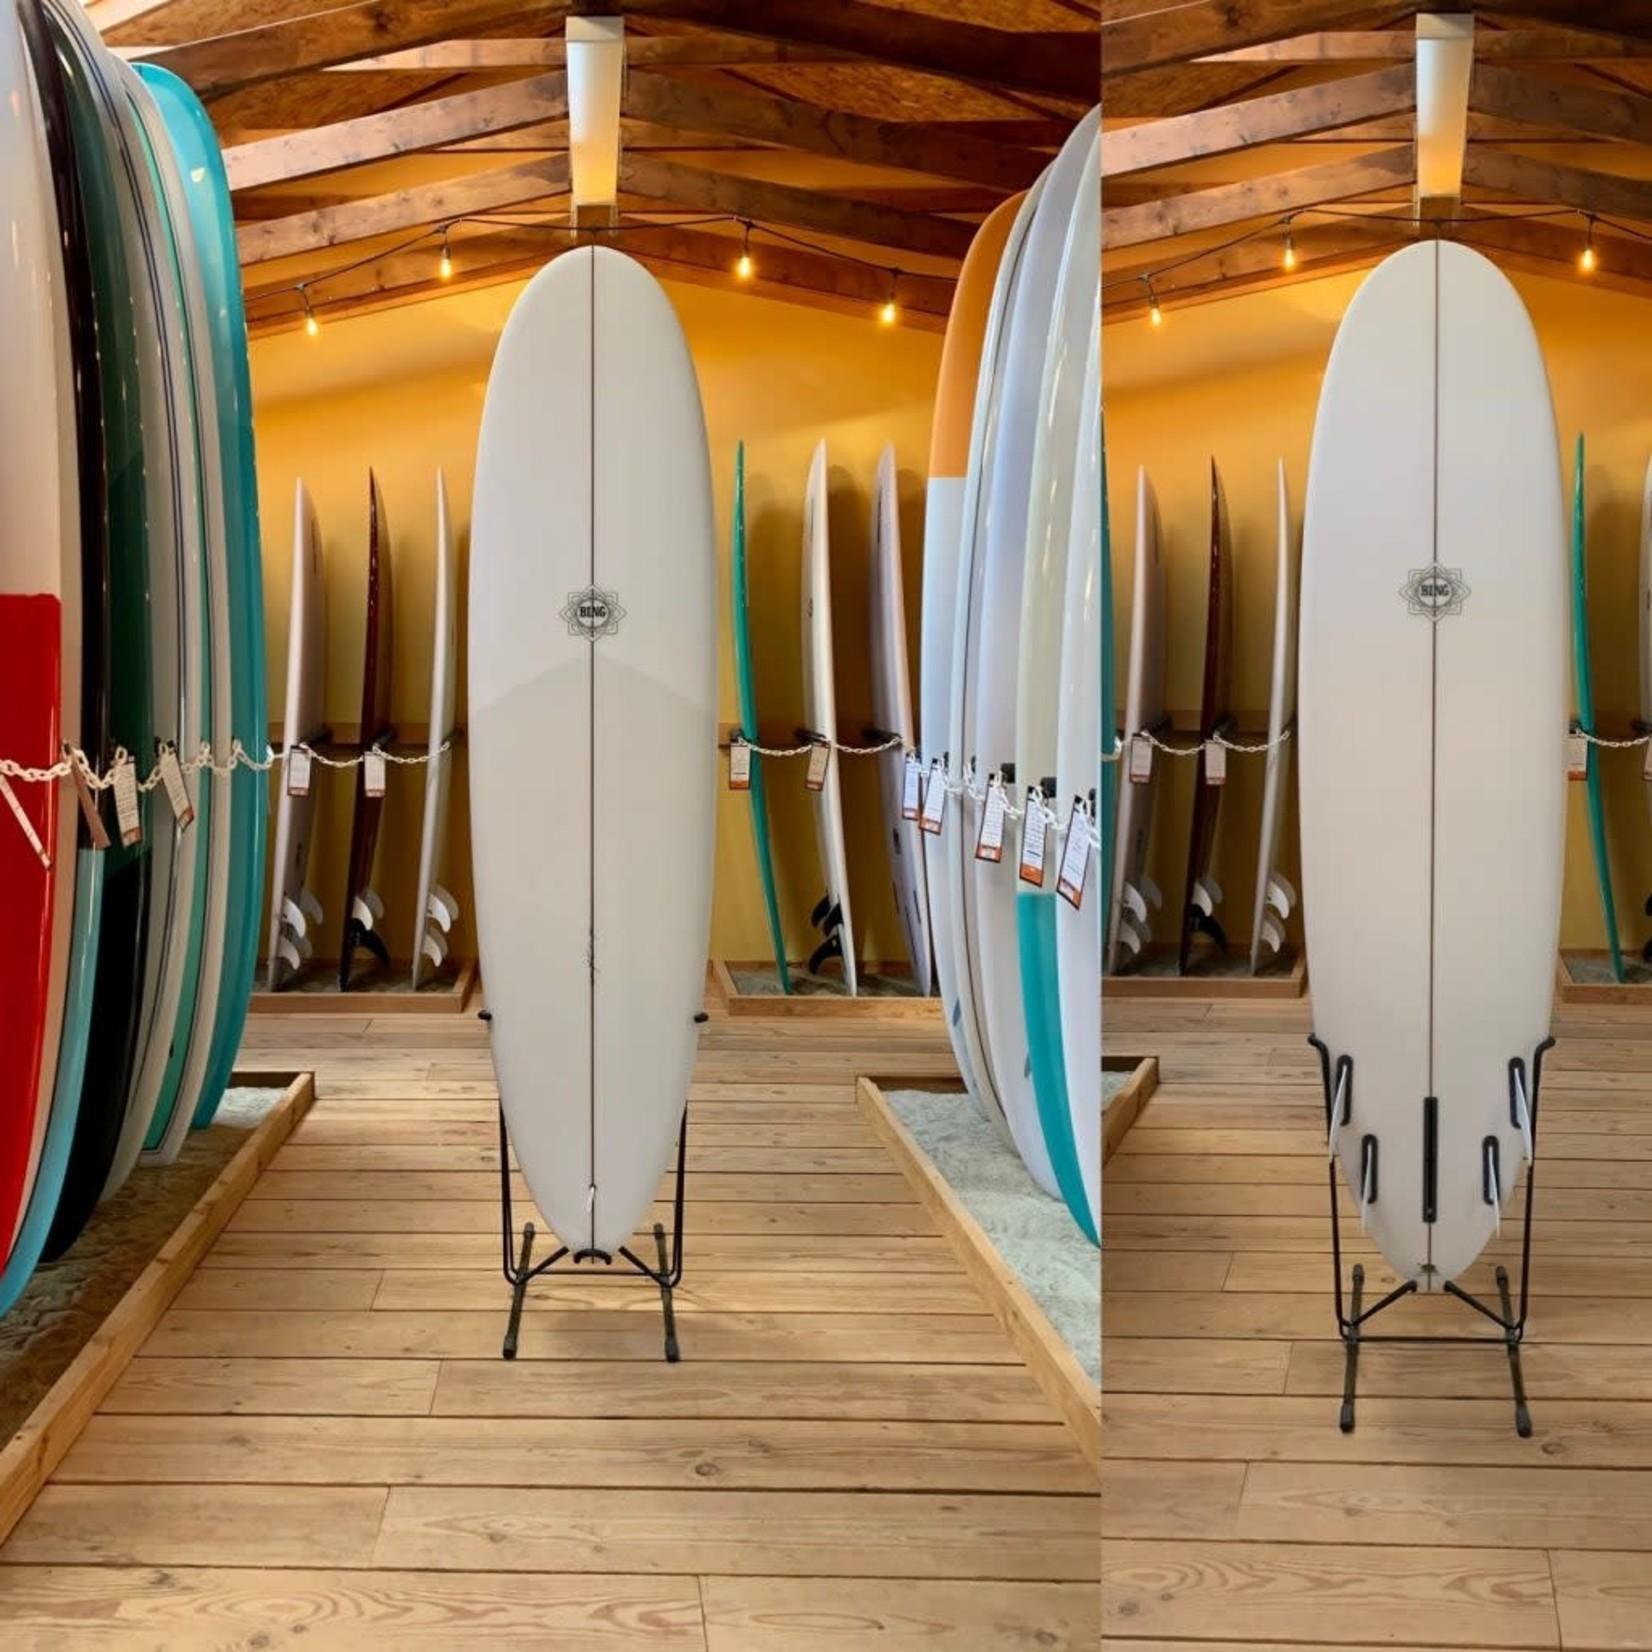 Bing Surfboards Prebook Bing Collector 8'0 *DEPOSIT ONLY